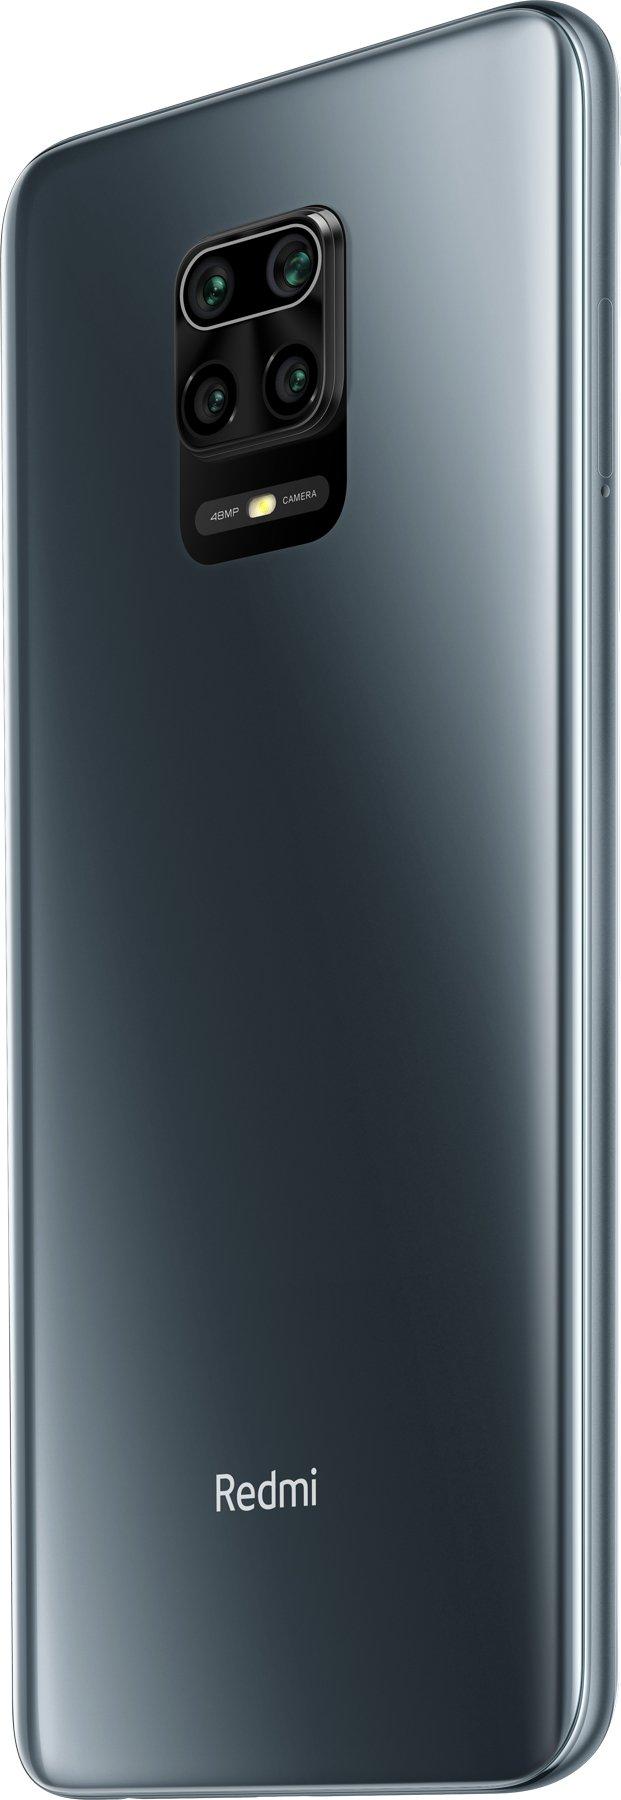 Xiaomi Redmi Note 9S 6GB/128GB grey - 4